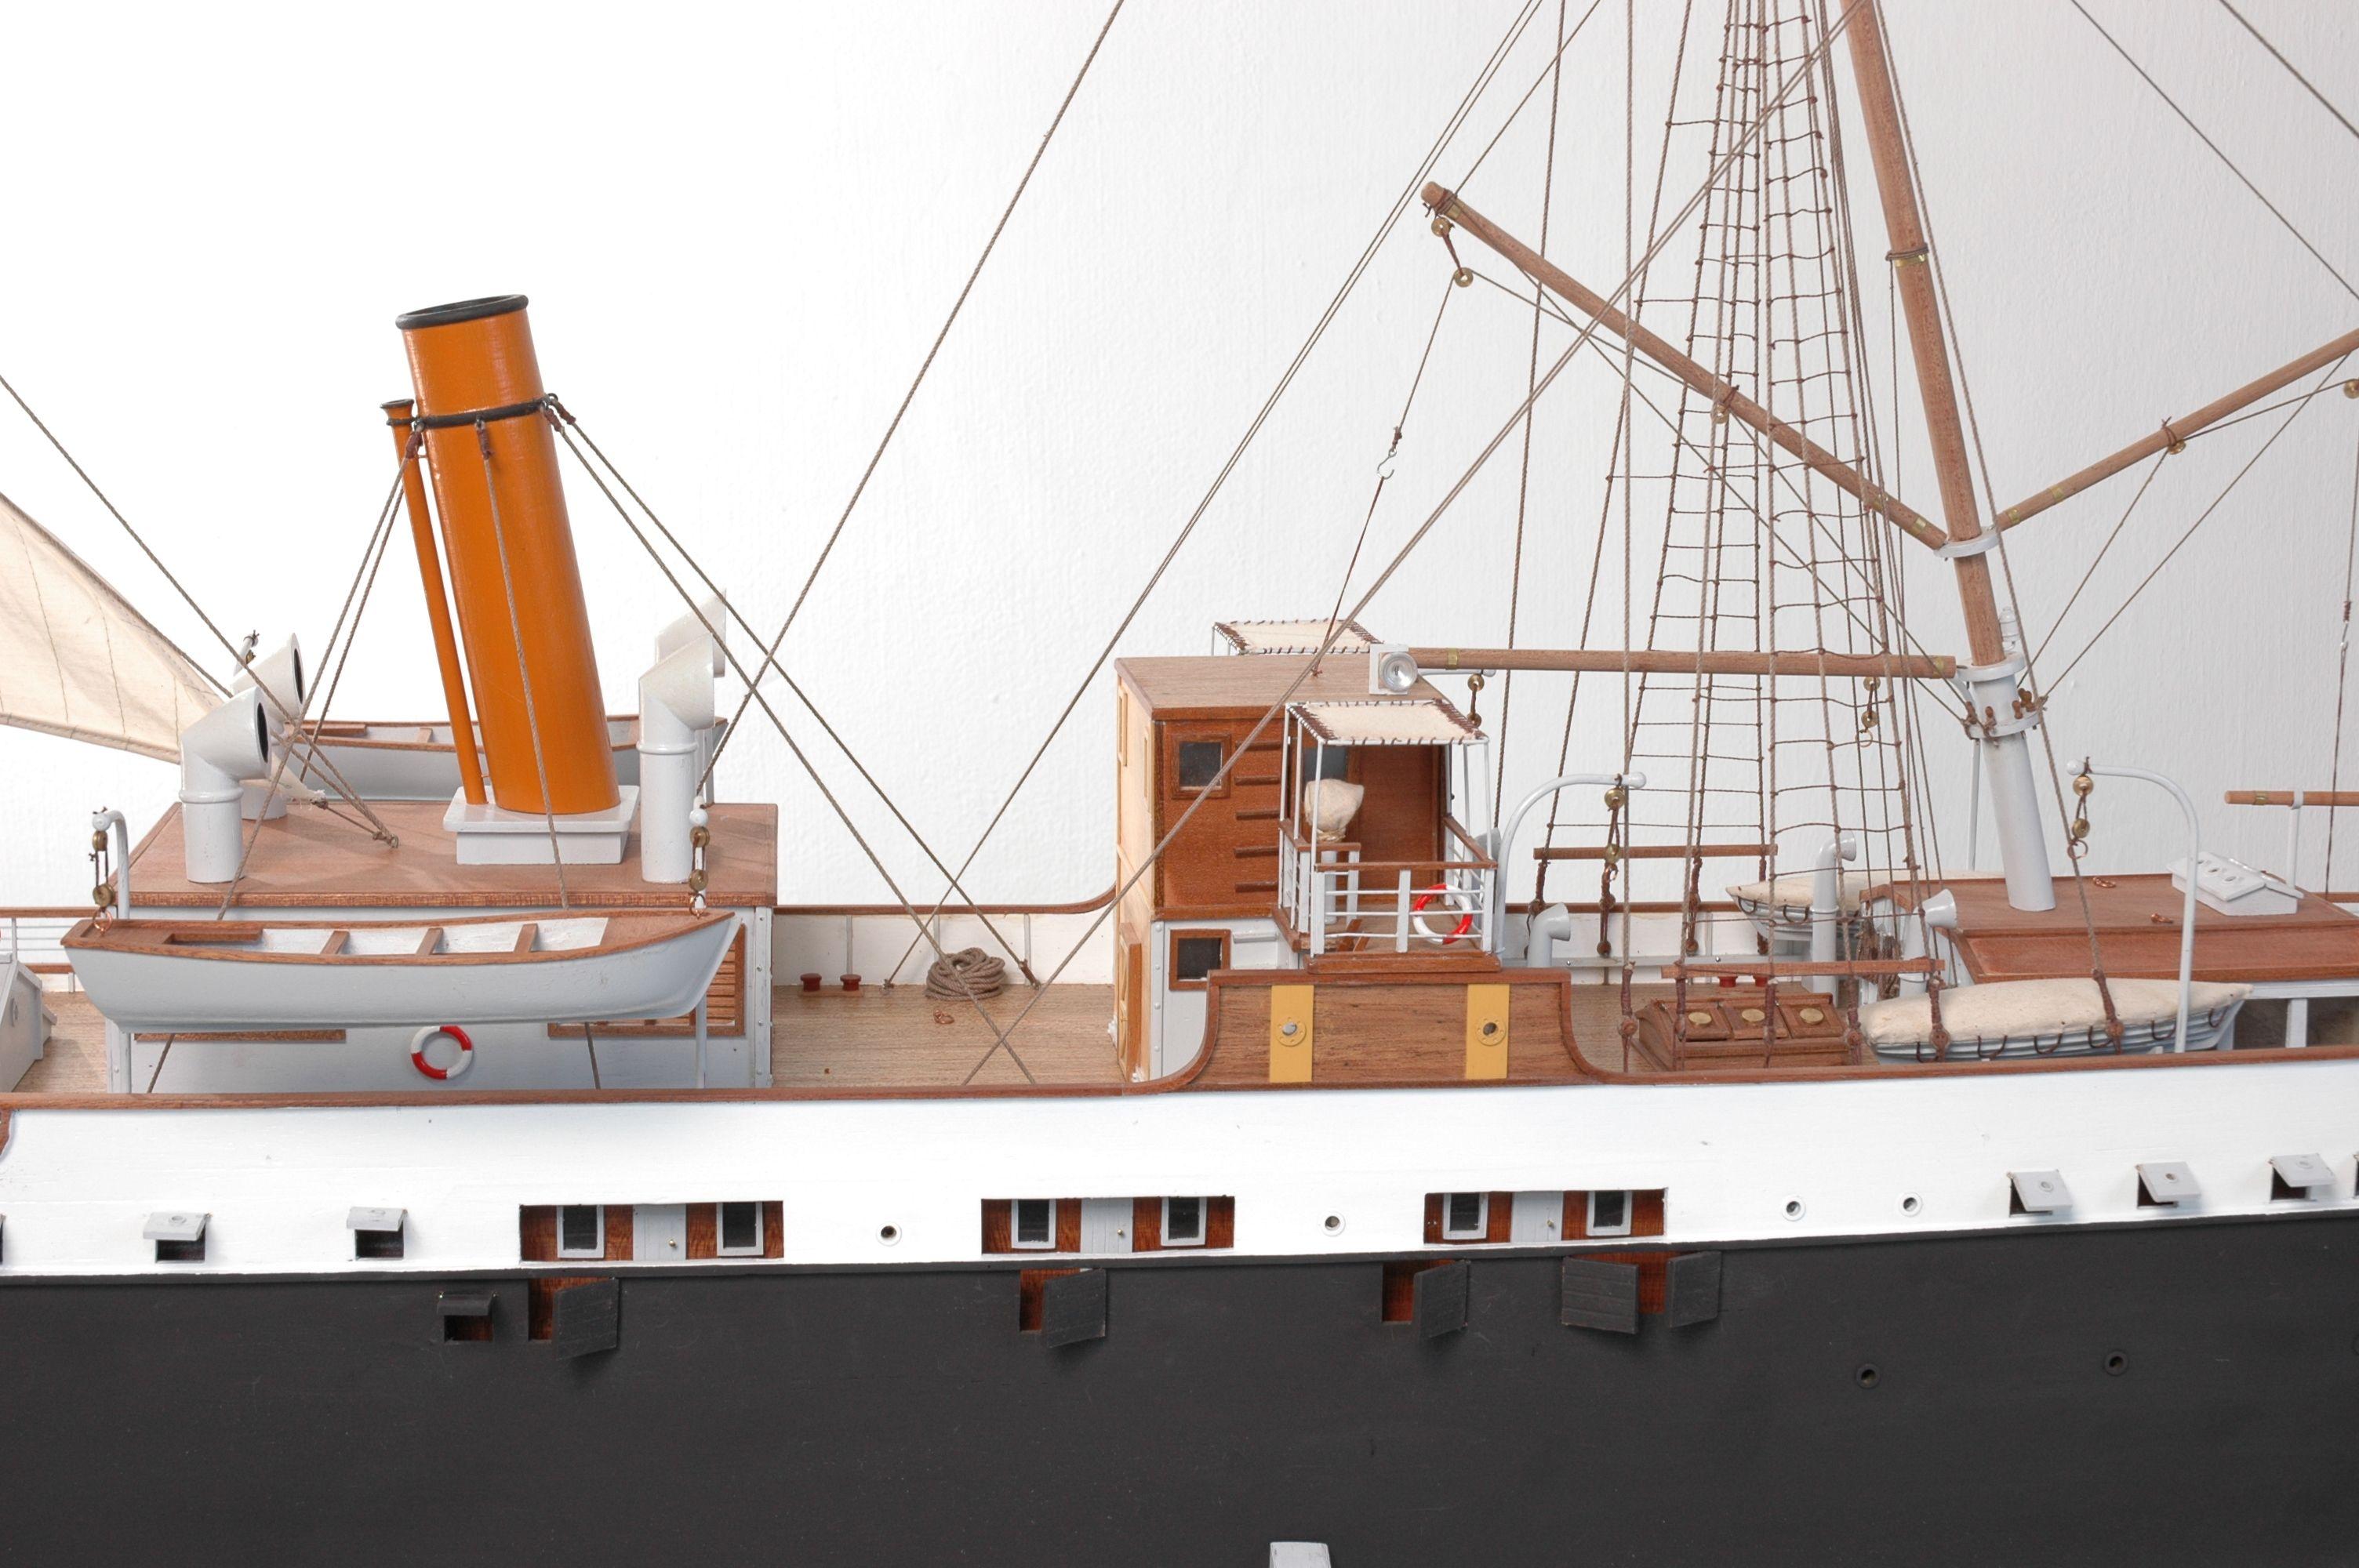 1416-6305-G-G-Loudon-Ship-Model-large-Premier-Range